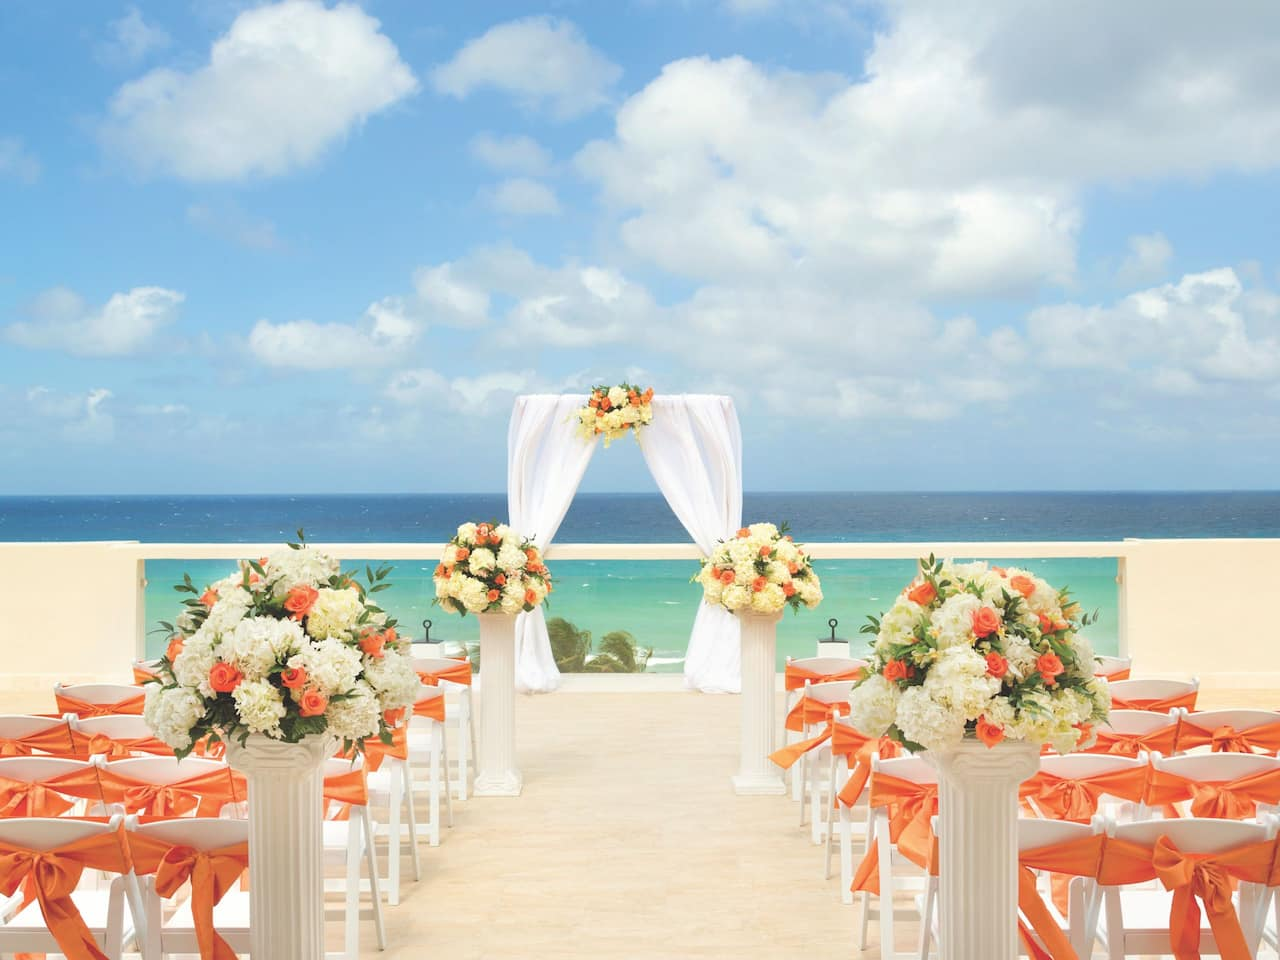 Wedding ceremony setup on resort beachfront